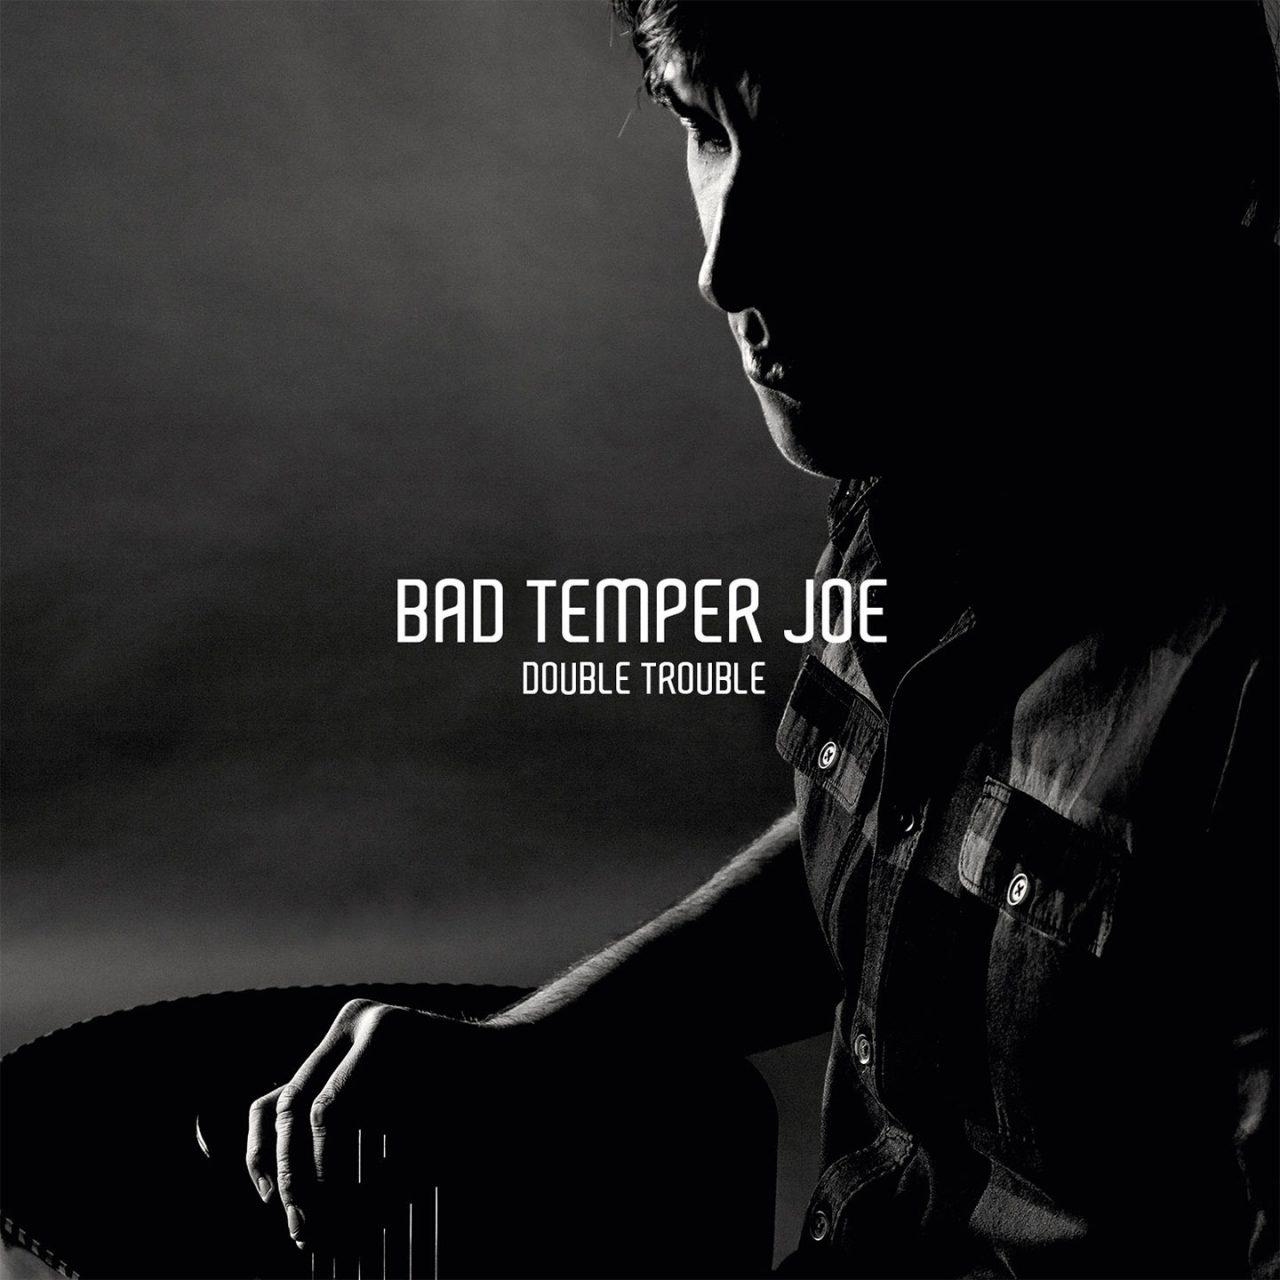 Bad Temper Joe – Double Trouble